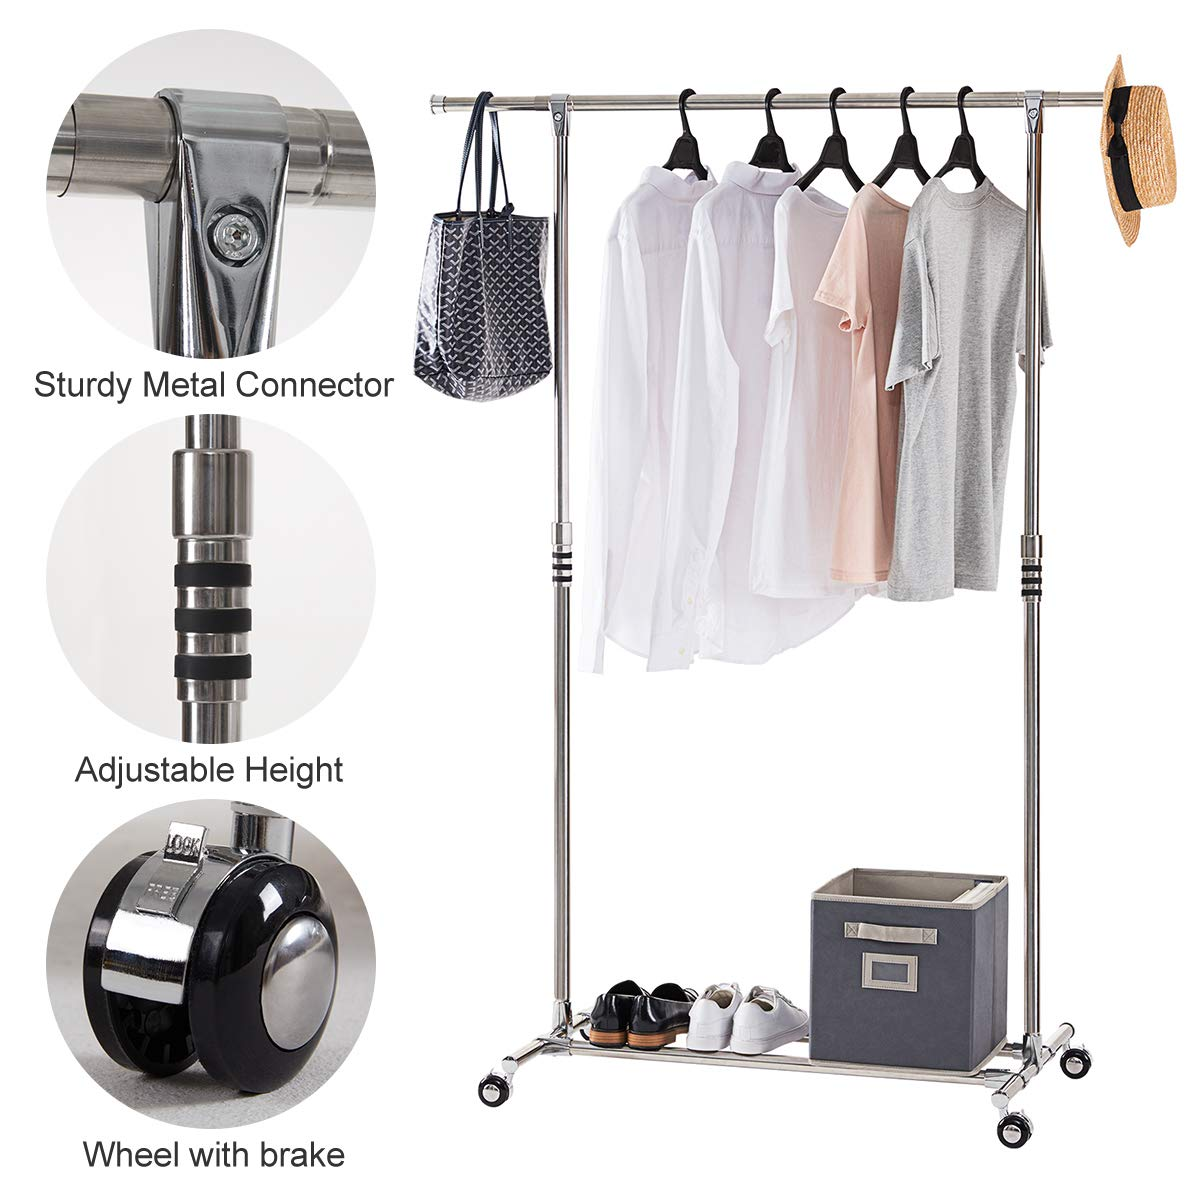 Portable Clothes Rack Organizer Height Adjustable Extendable Garment Rack with Bottom Shelf YOUDENOVA Rolling Clothing Rack on Wheels